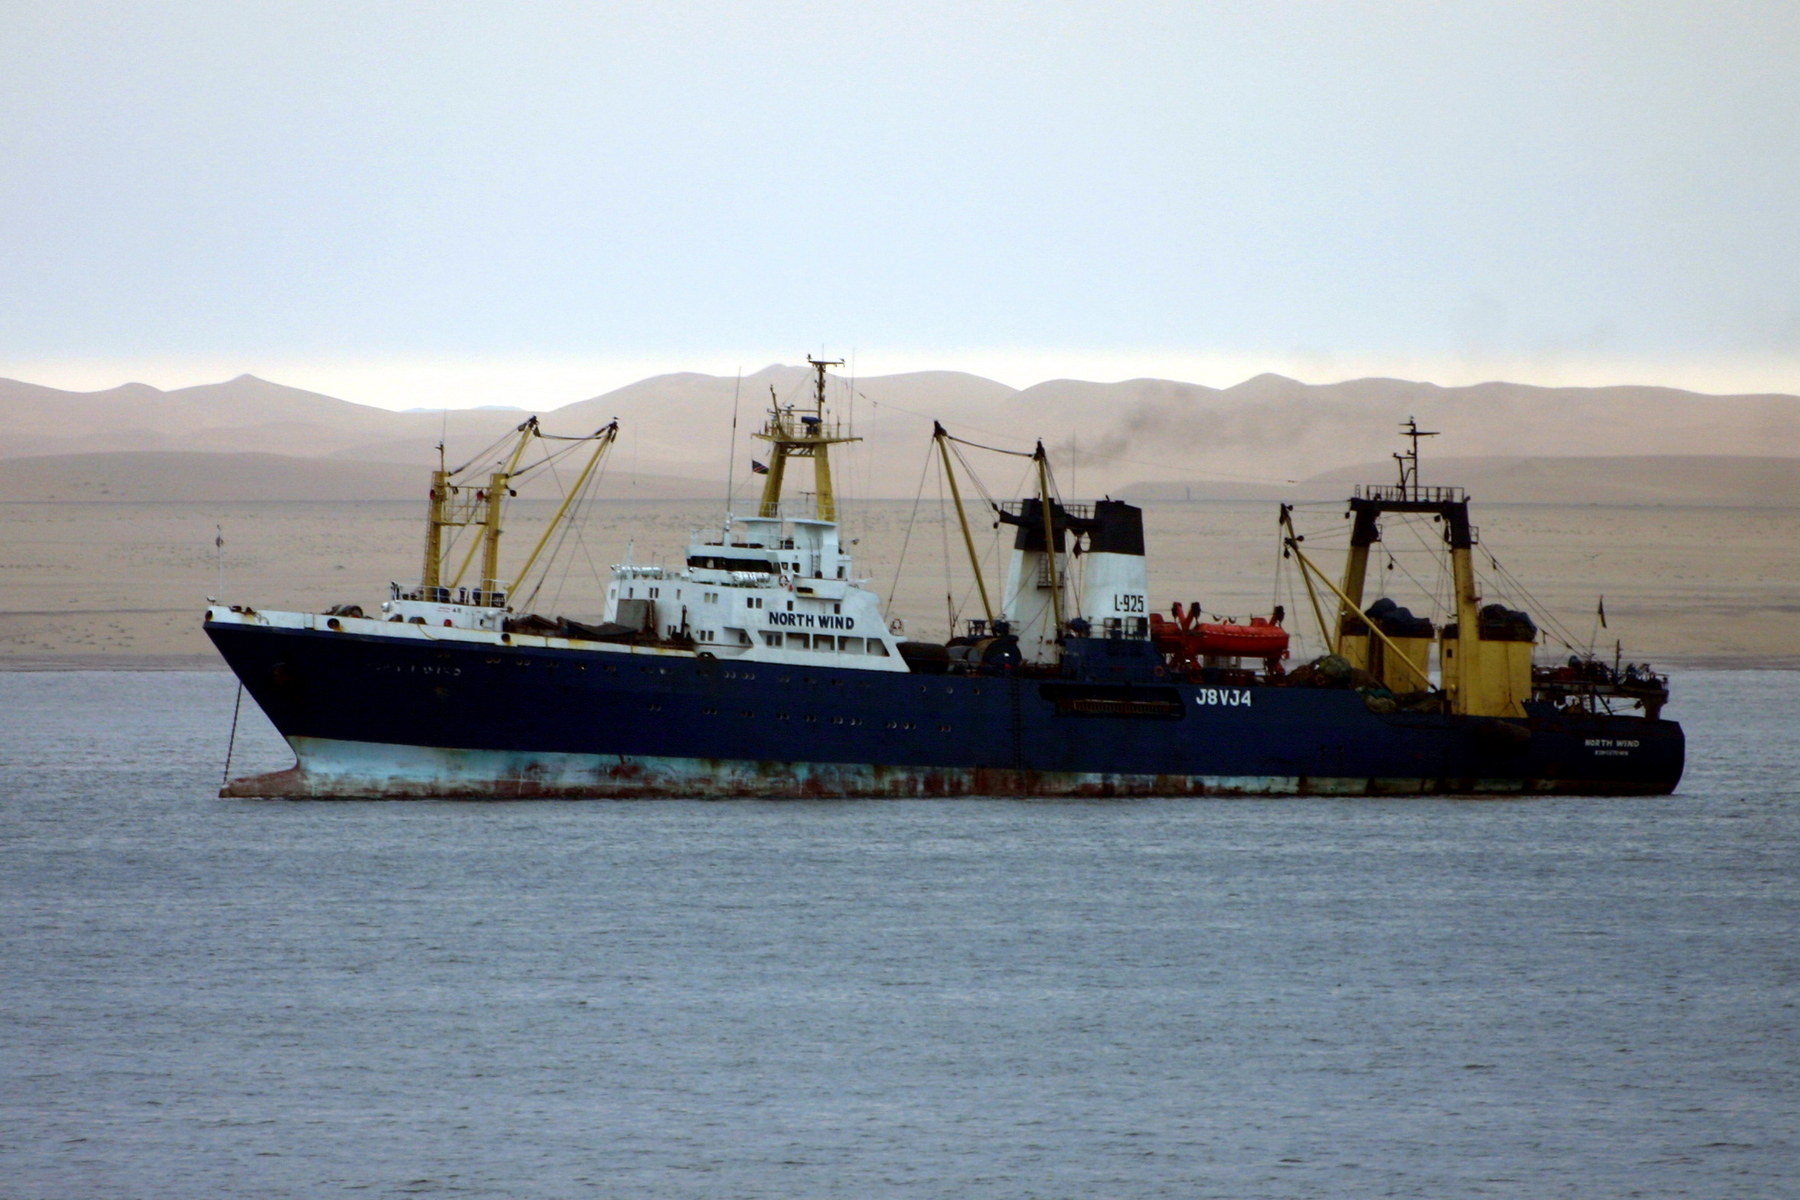 рыболовный траулер тип судна